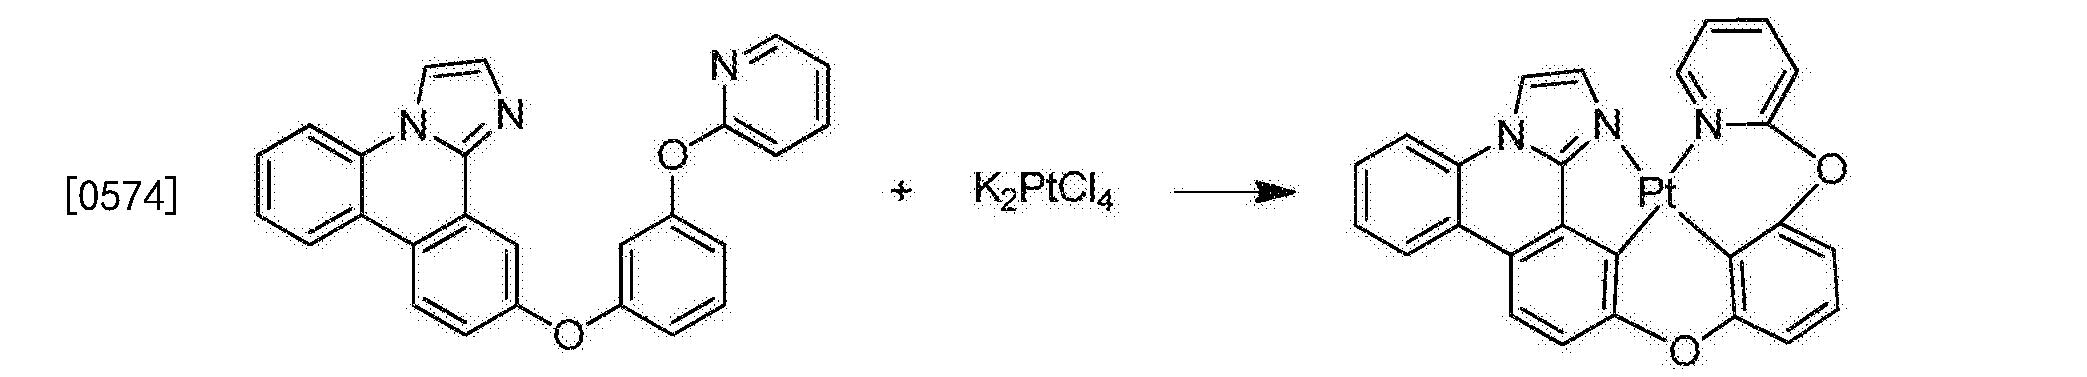 Figure CN106749425AD01633